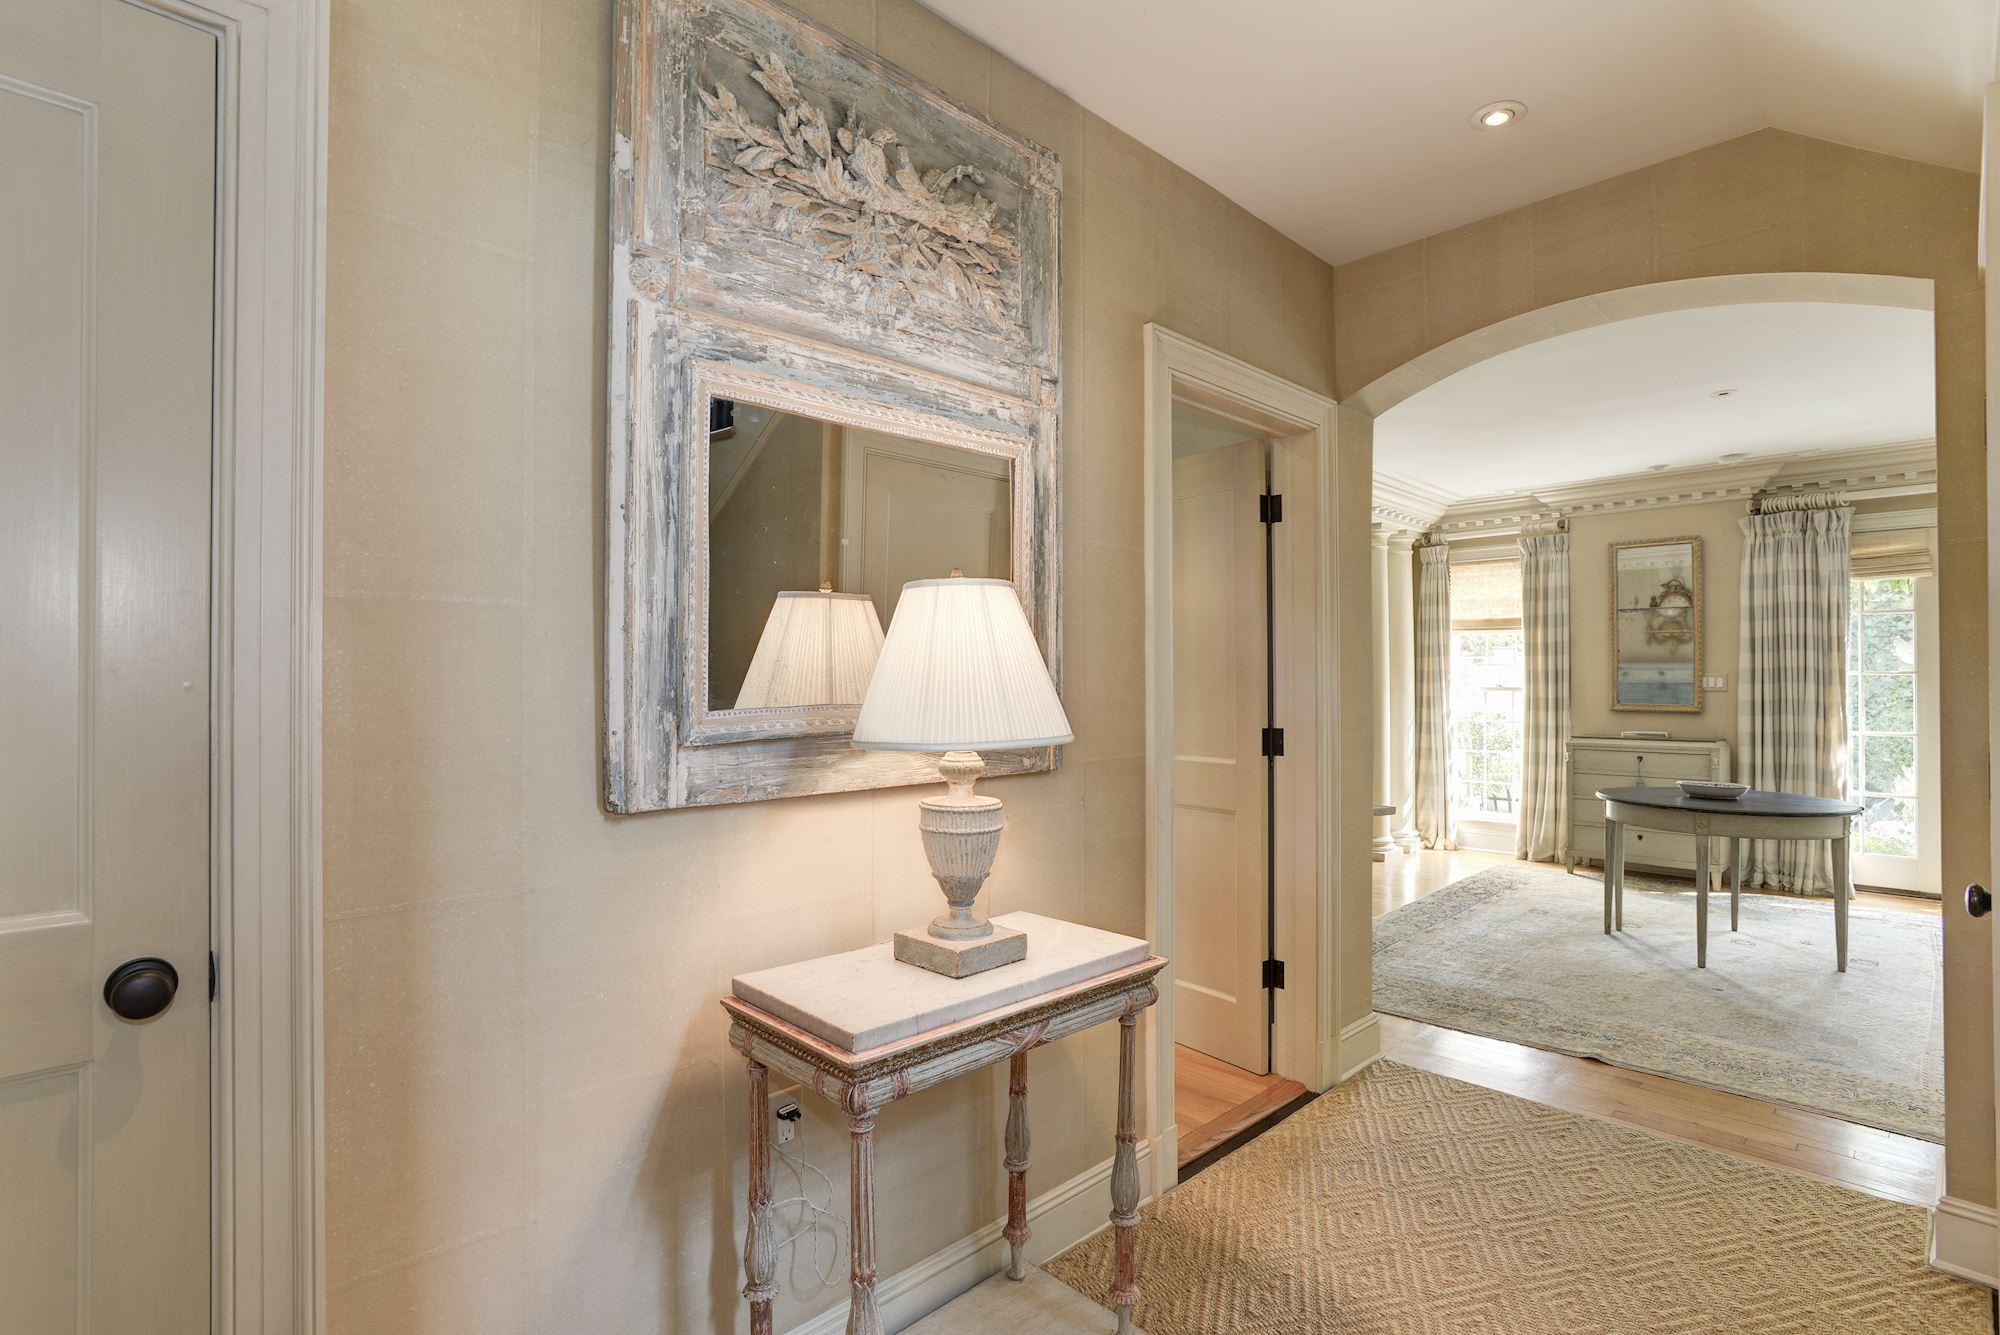 House Foyer Xl : O st nw washington dc